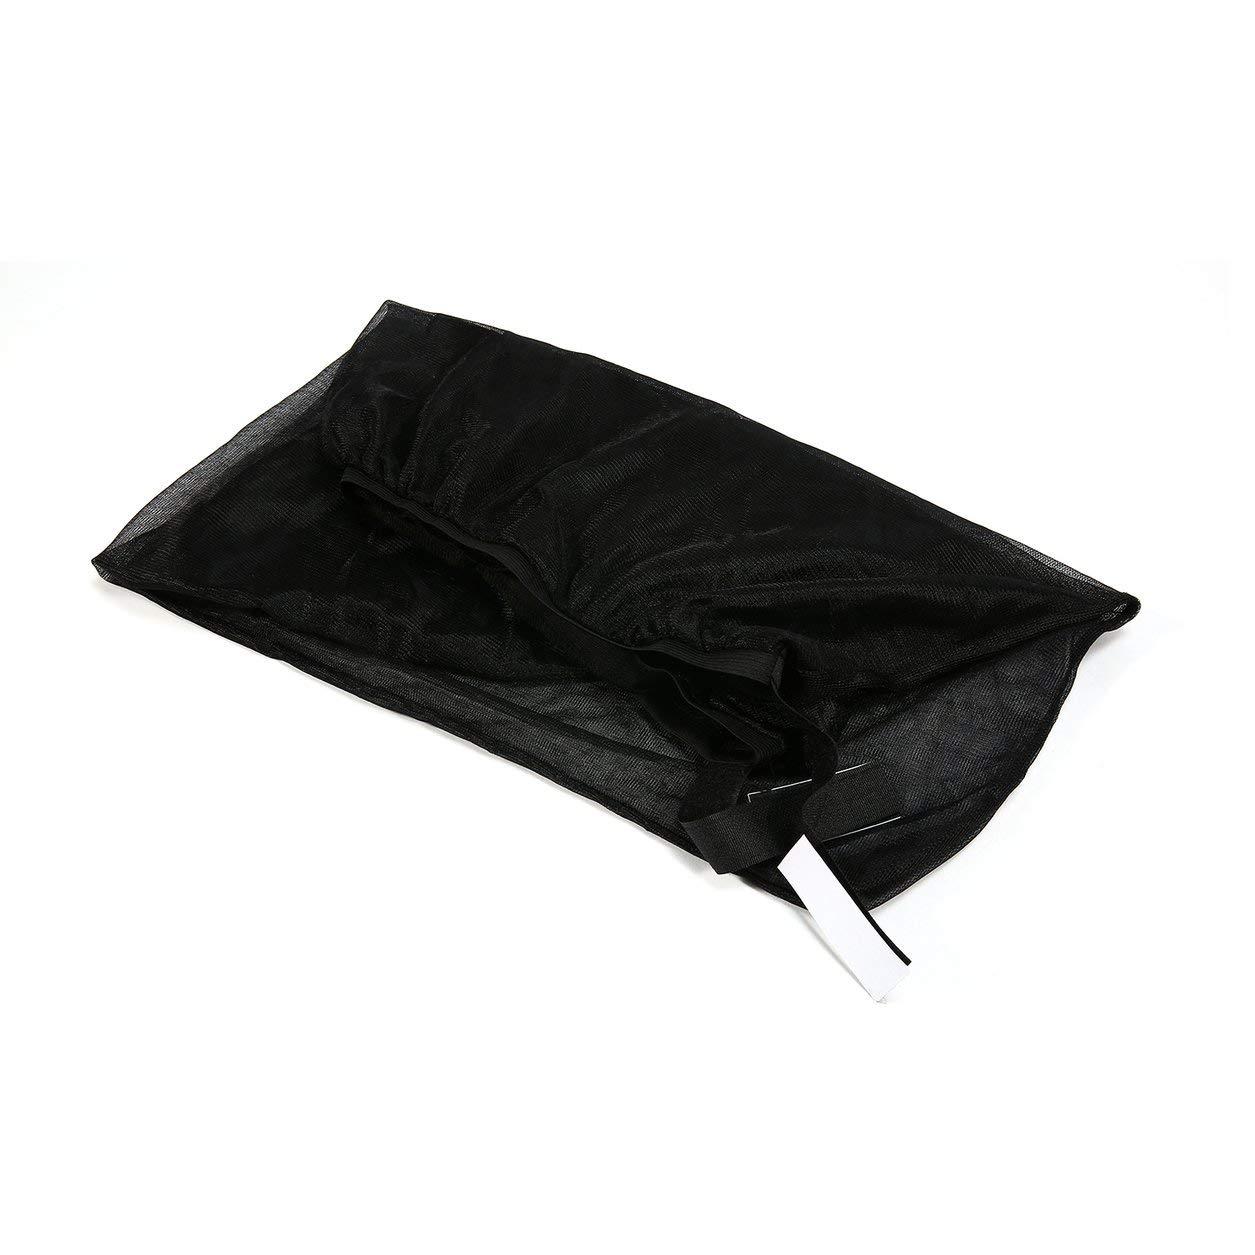 Dailyinshop 2Pcs Car Side Rear Window Sun Shade Mosquito Proof UV Protection Mesh Curtain